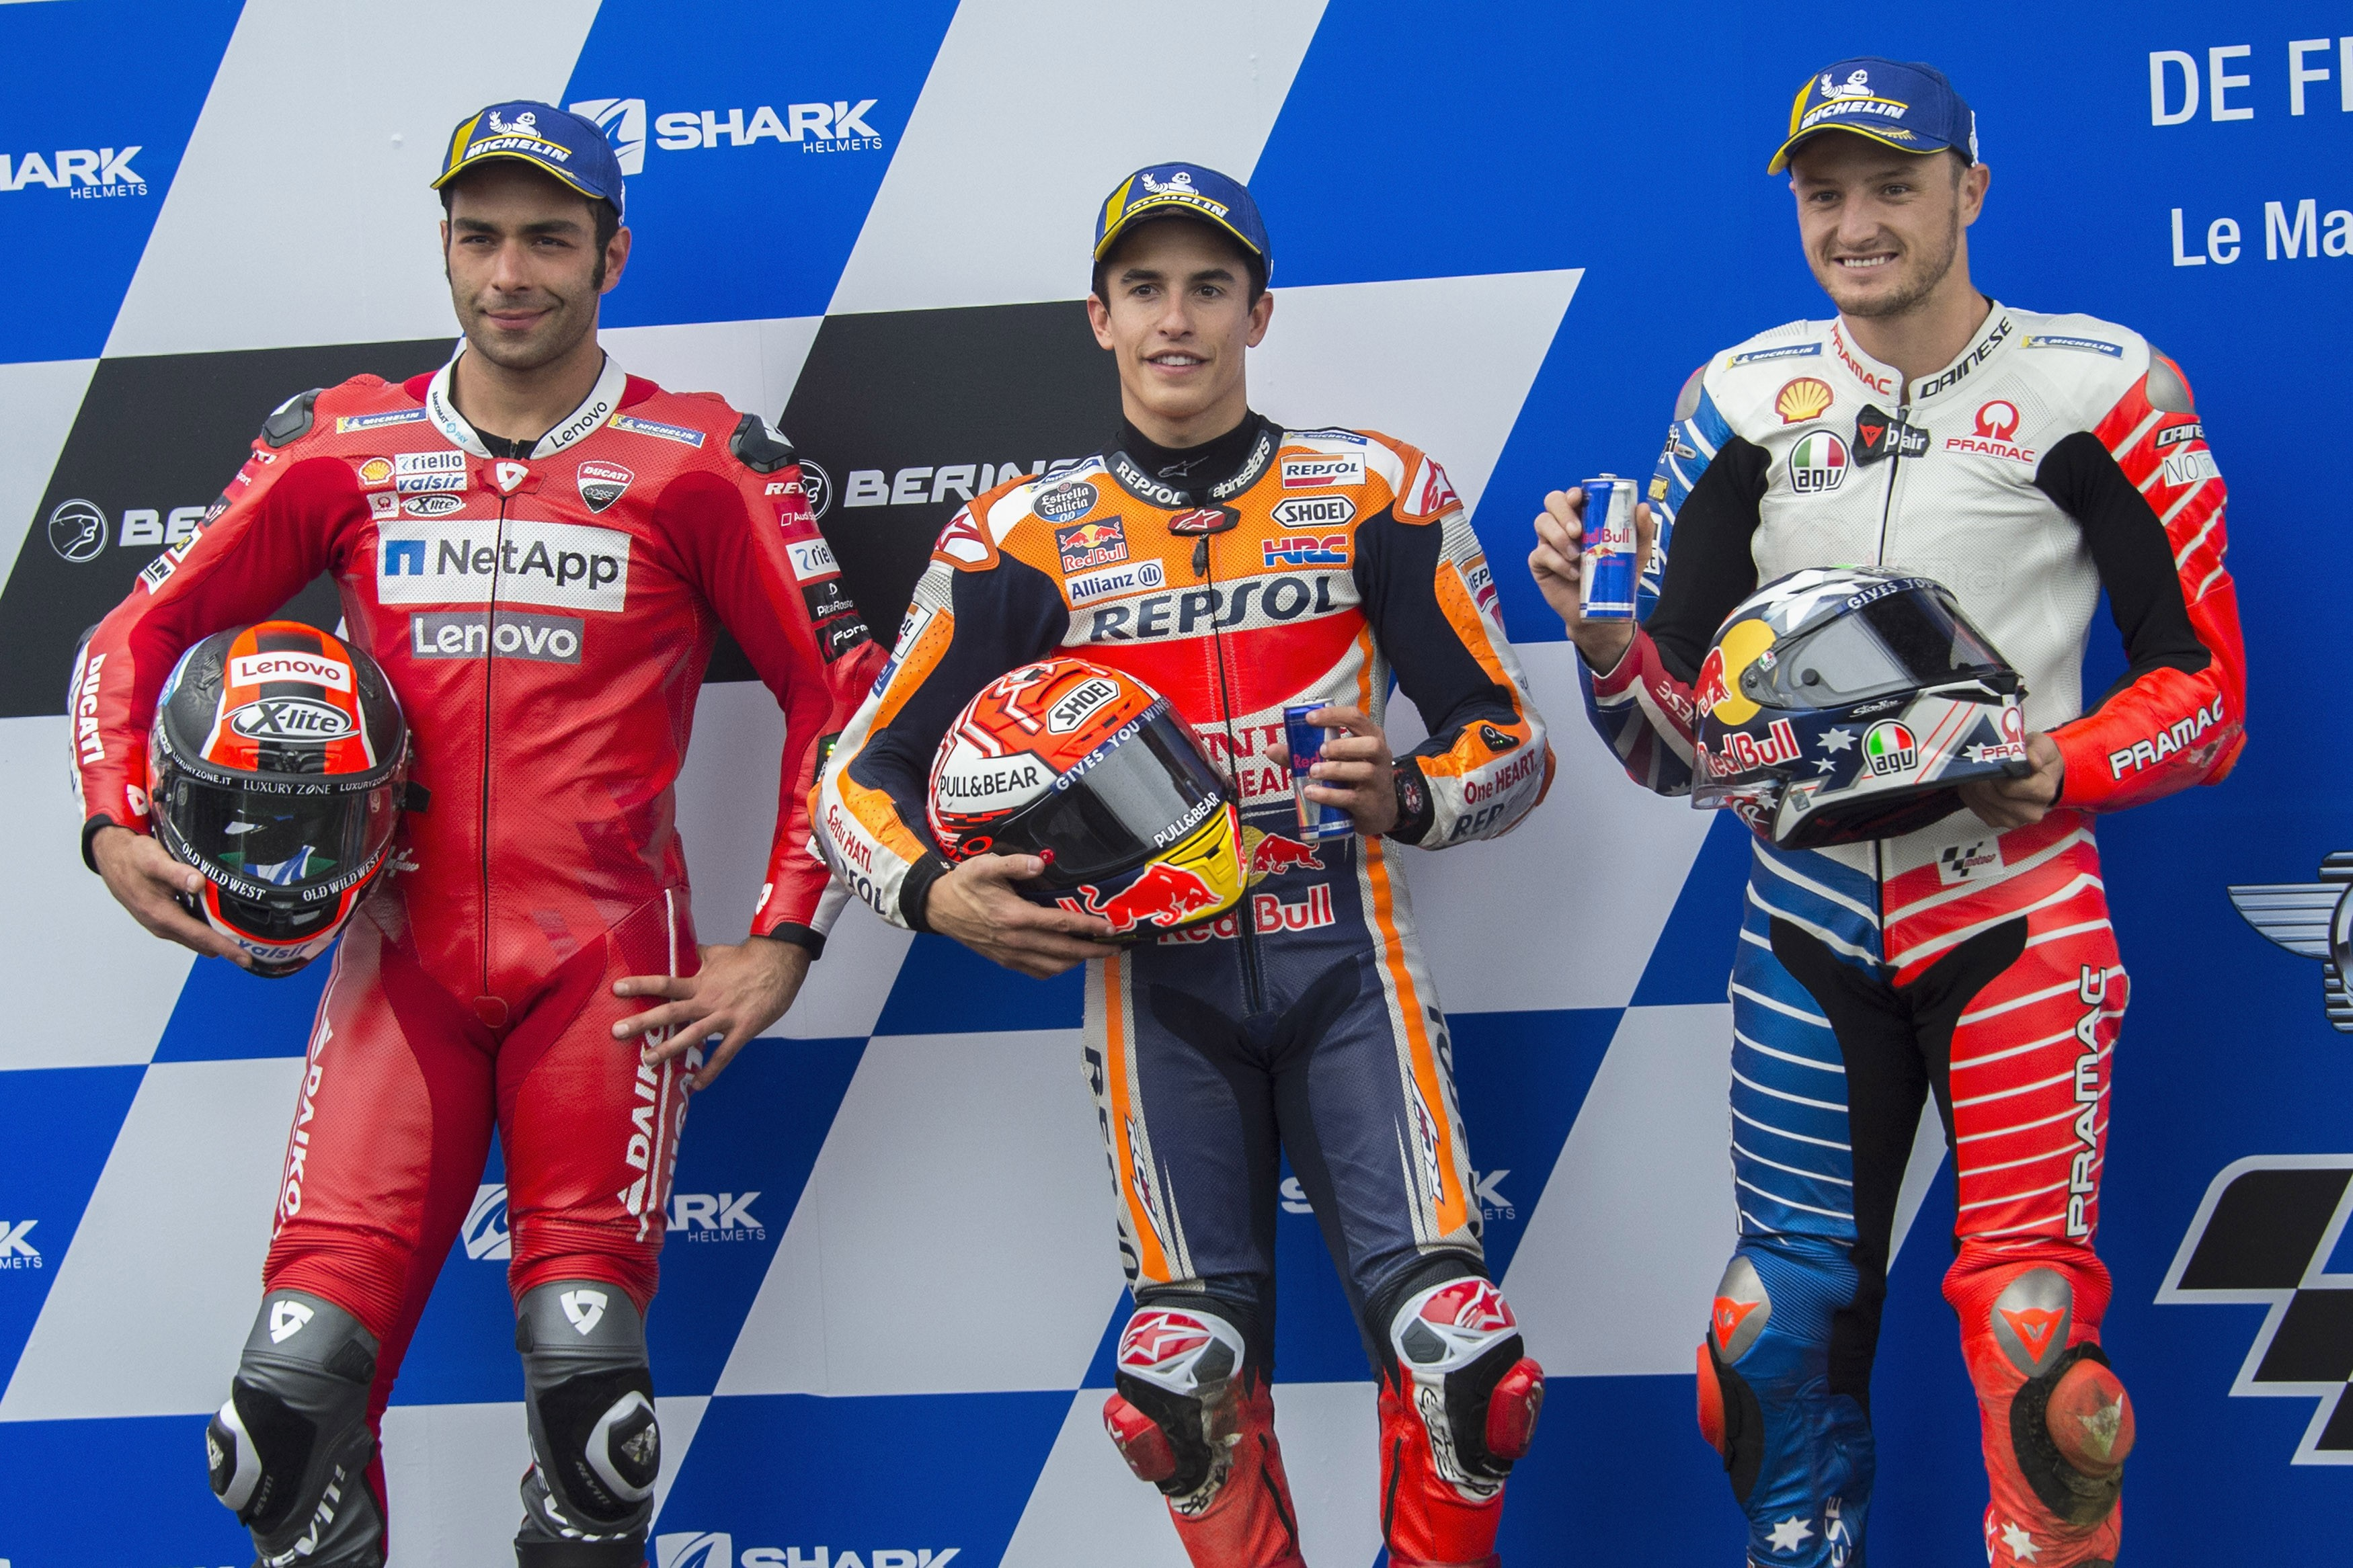 Marc Marquez (Honda HRC), Danilo Petrucci (Ducati Team) et Jack Miller (Ducati Pramac) au Grand Prix de France 2019